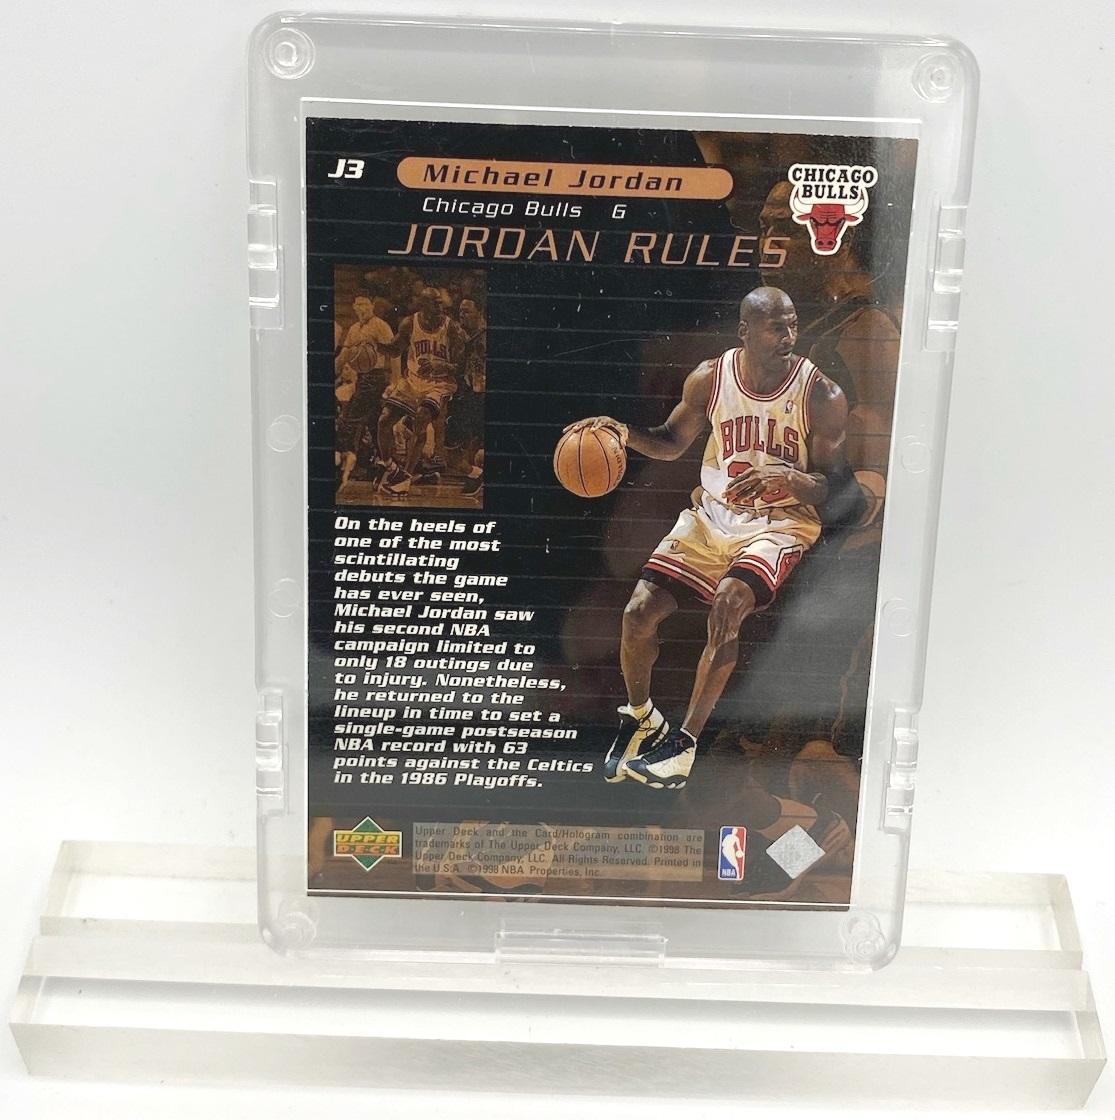 1998 Michael Jordan (JORDAN RULES-Upper Deck BRONZE CARD-#J3)=2pcs (2)